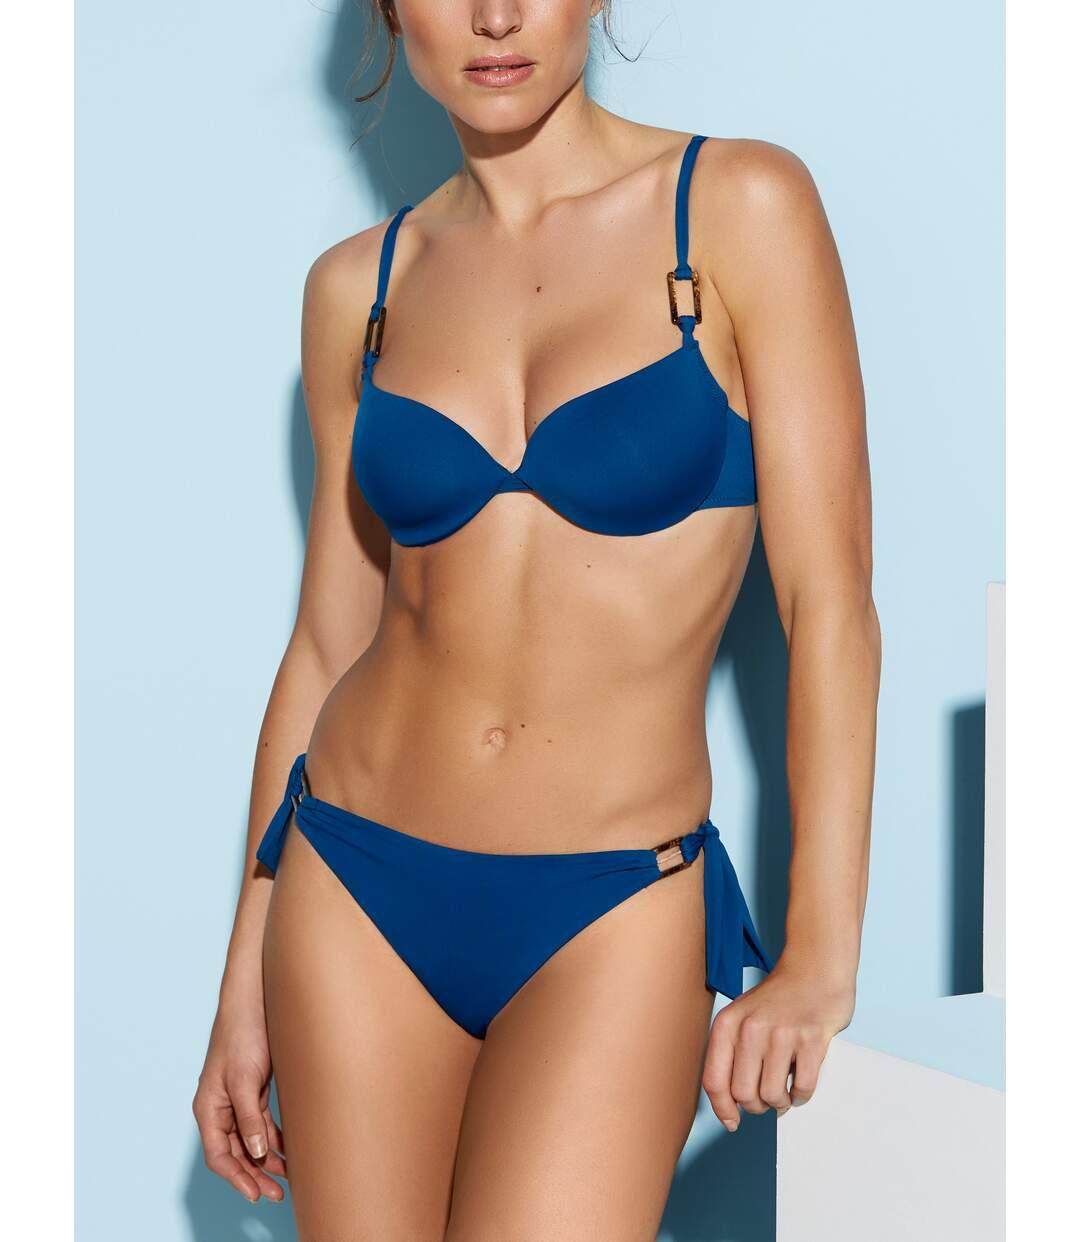 Dégagement Haut maillot de bain balconnet Summer Paradise Selmark Mare dsf.d455nksdKLFHG